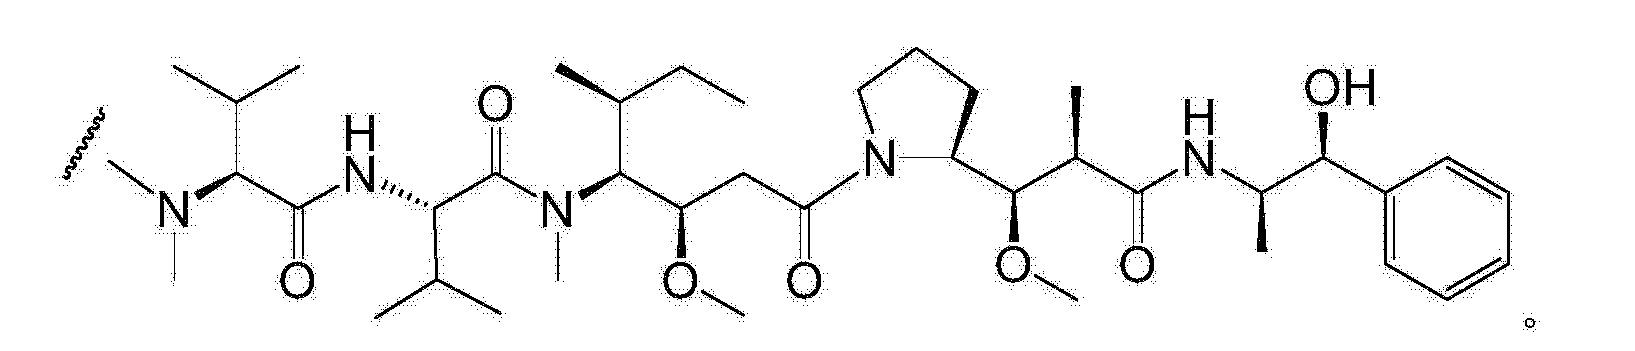 Figure CN104411721AD00142